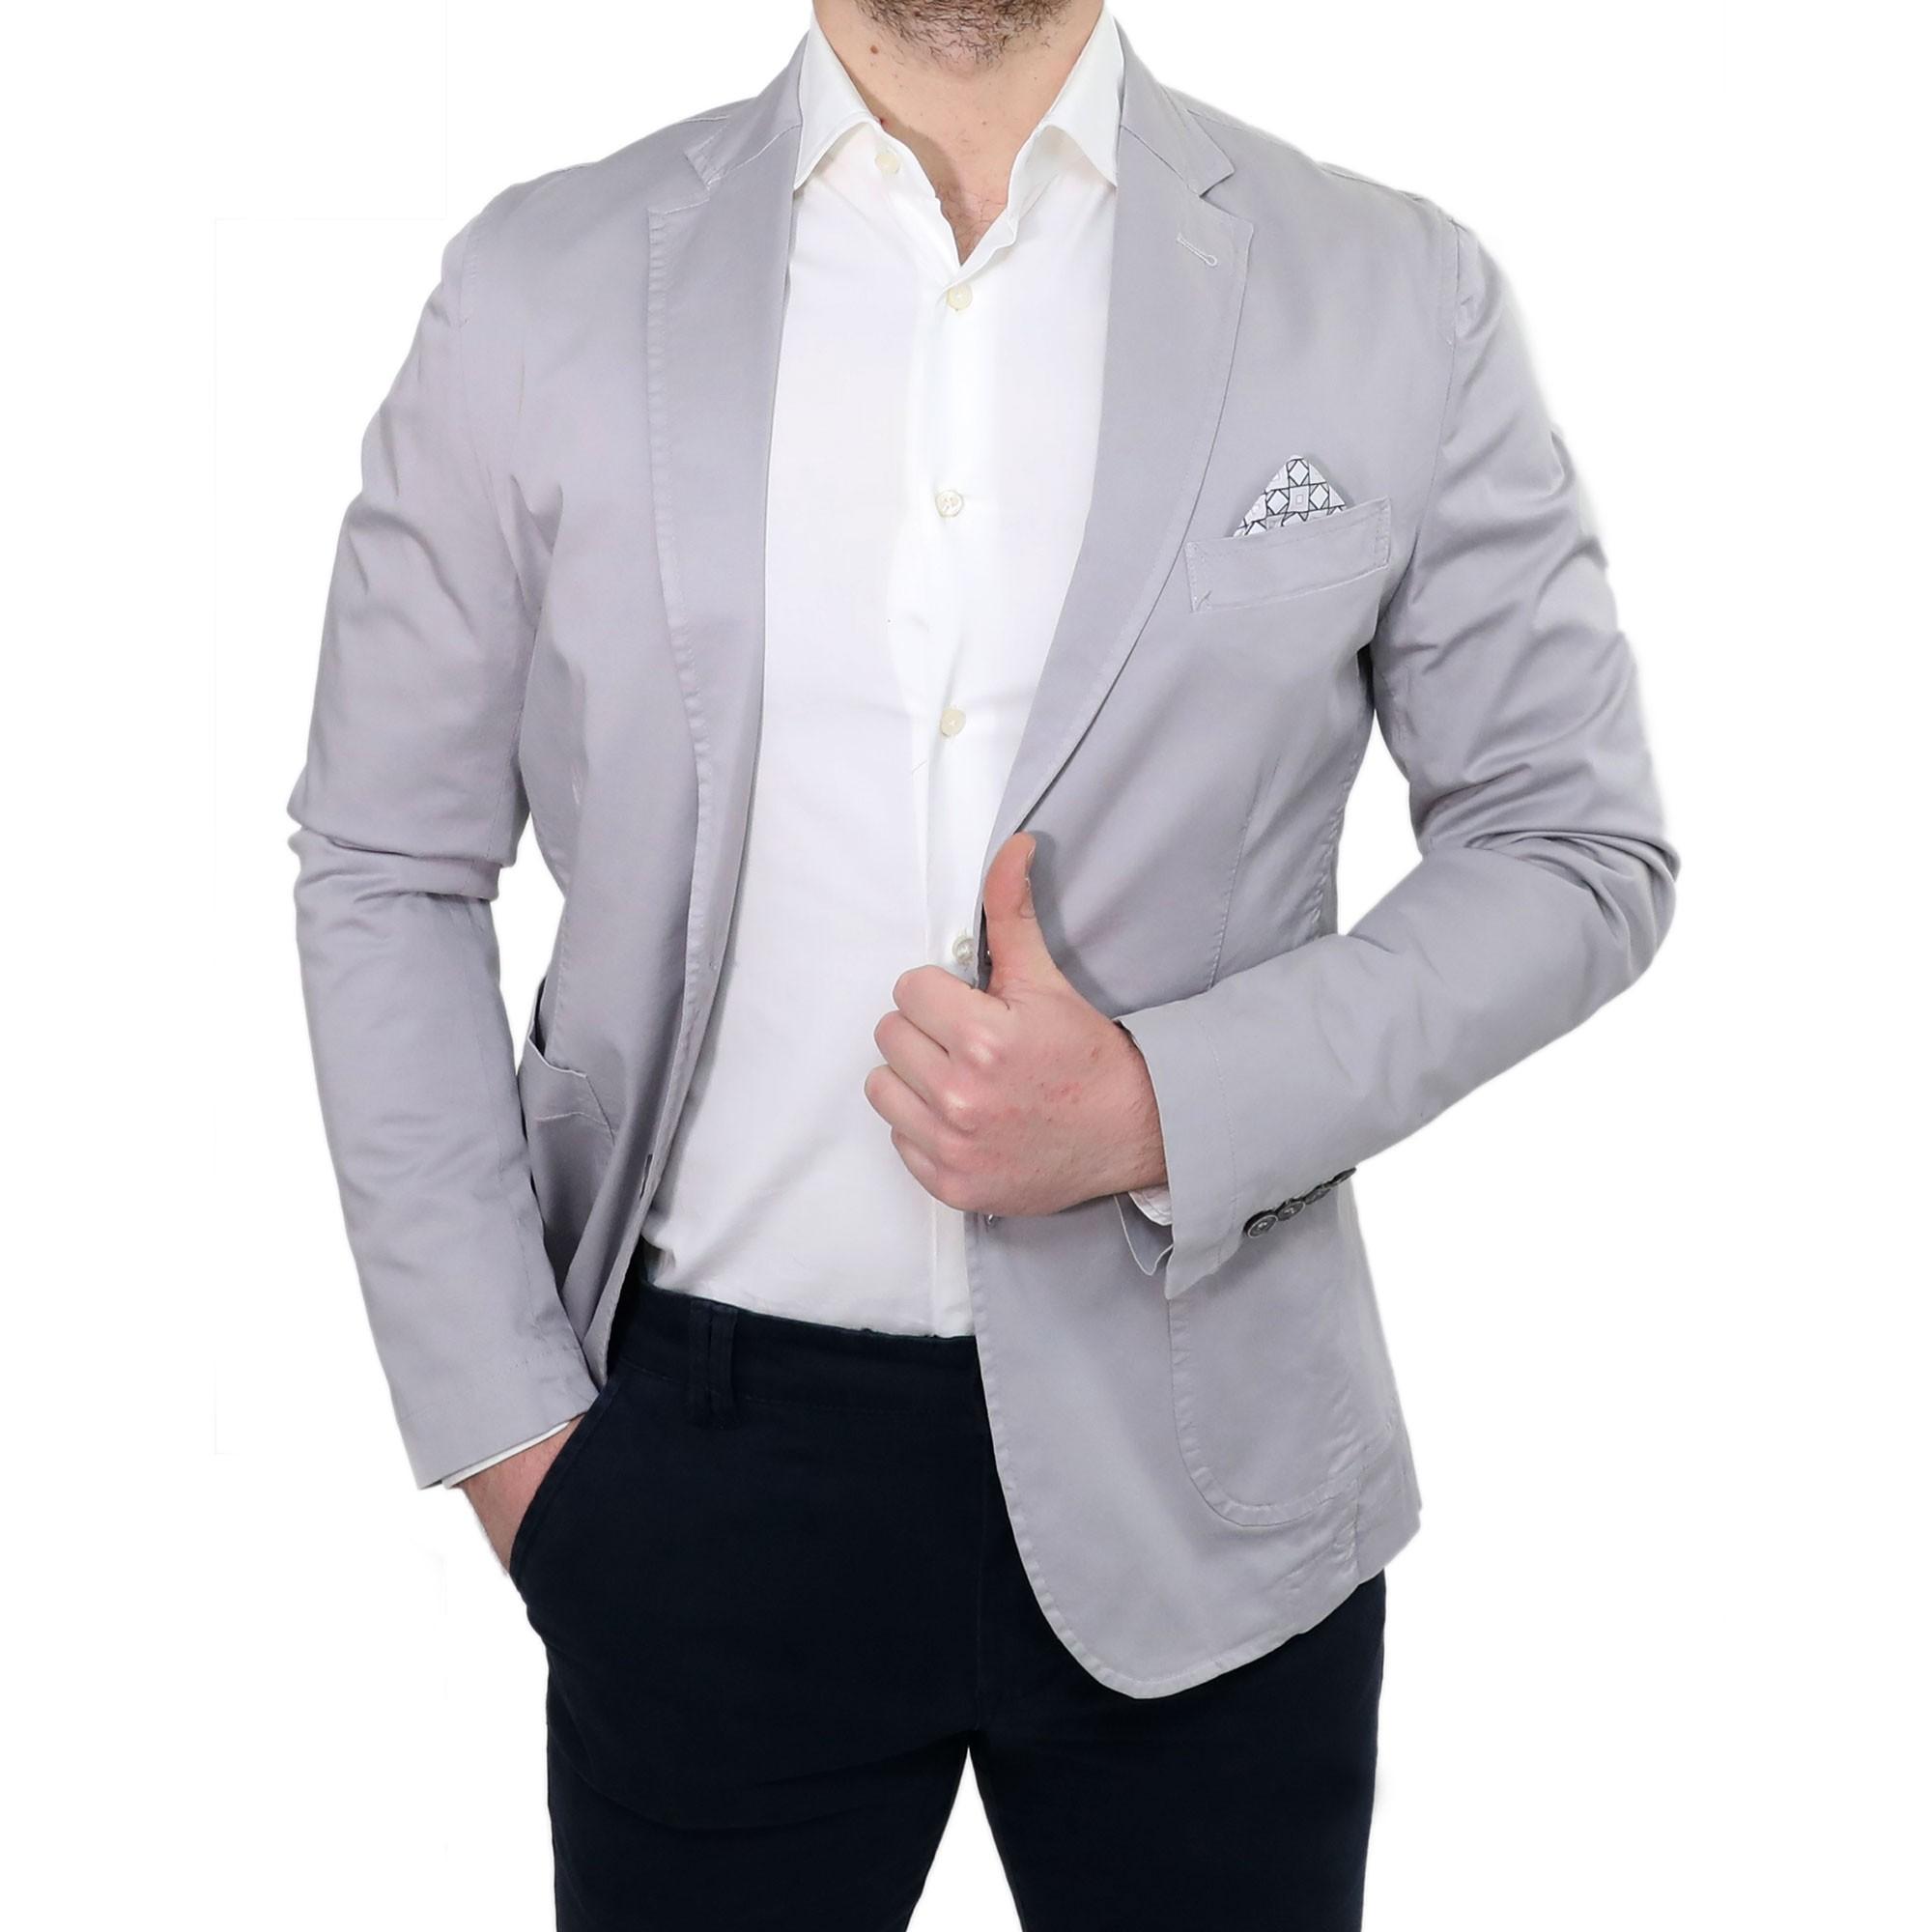 Giacca Blazer Uomo Elegante Slim Fit Classica Grigio Perla Sartoriale Casual 61c48a251f3